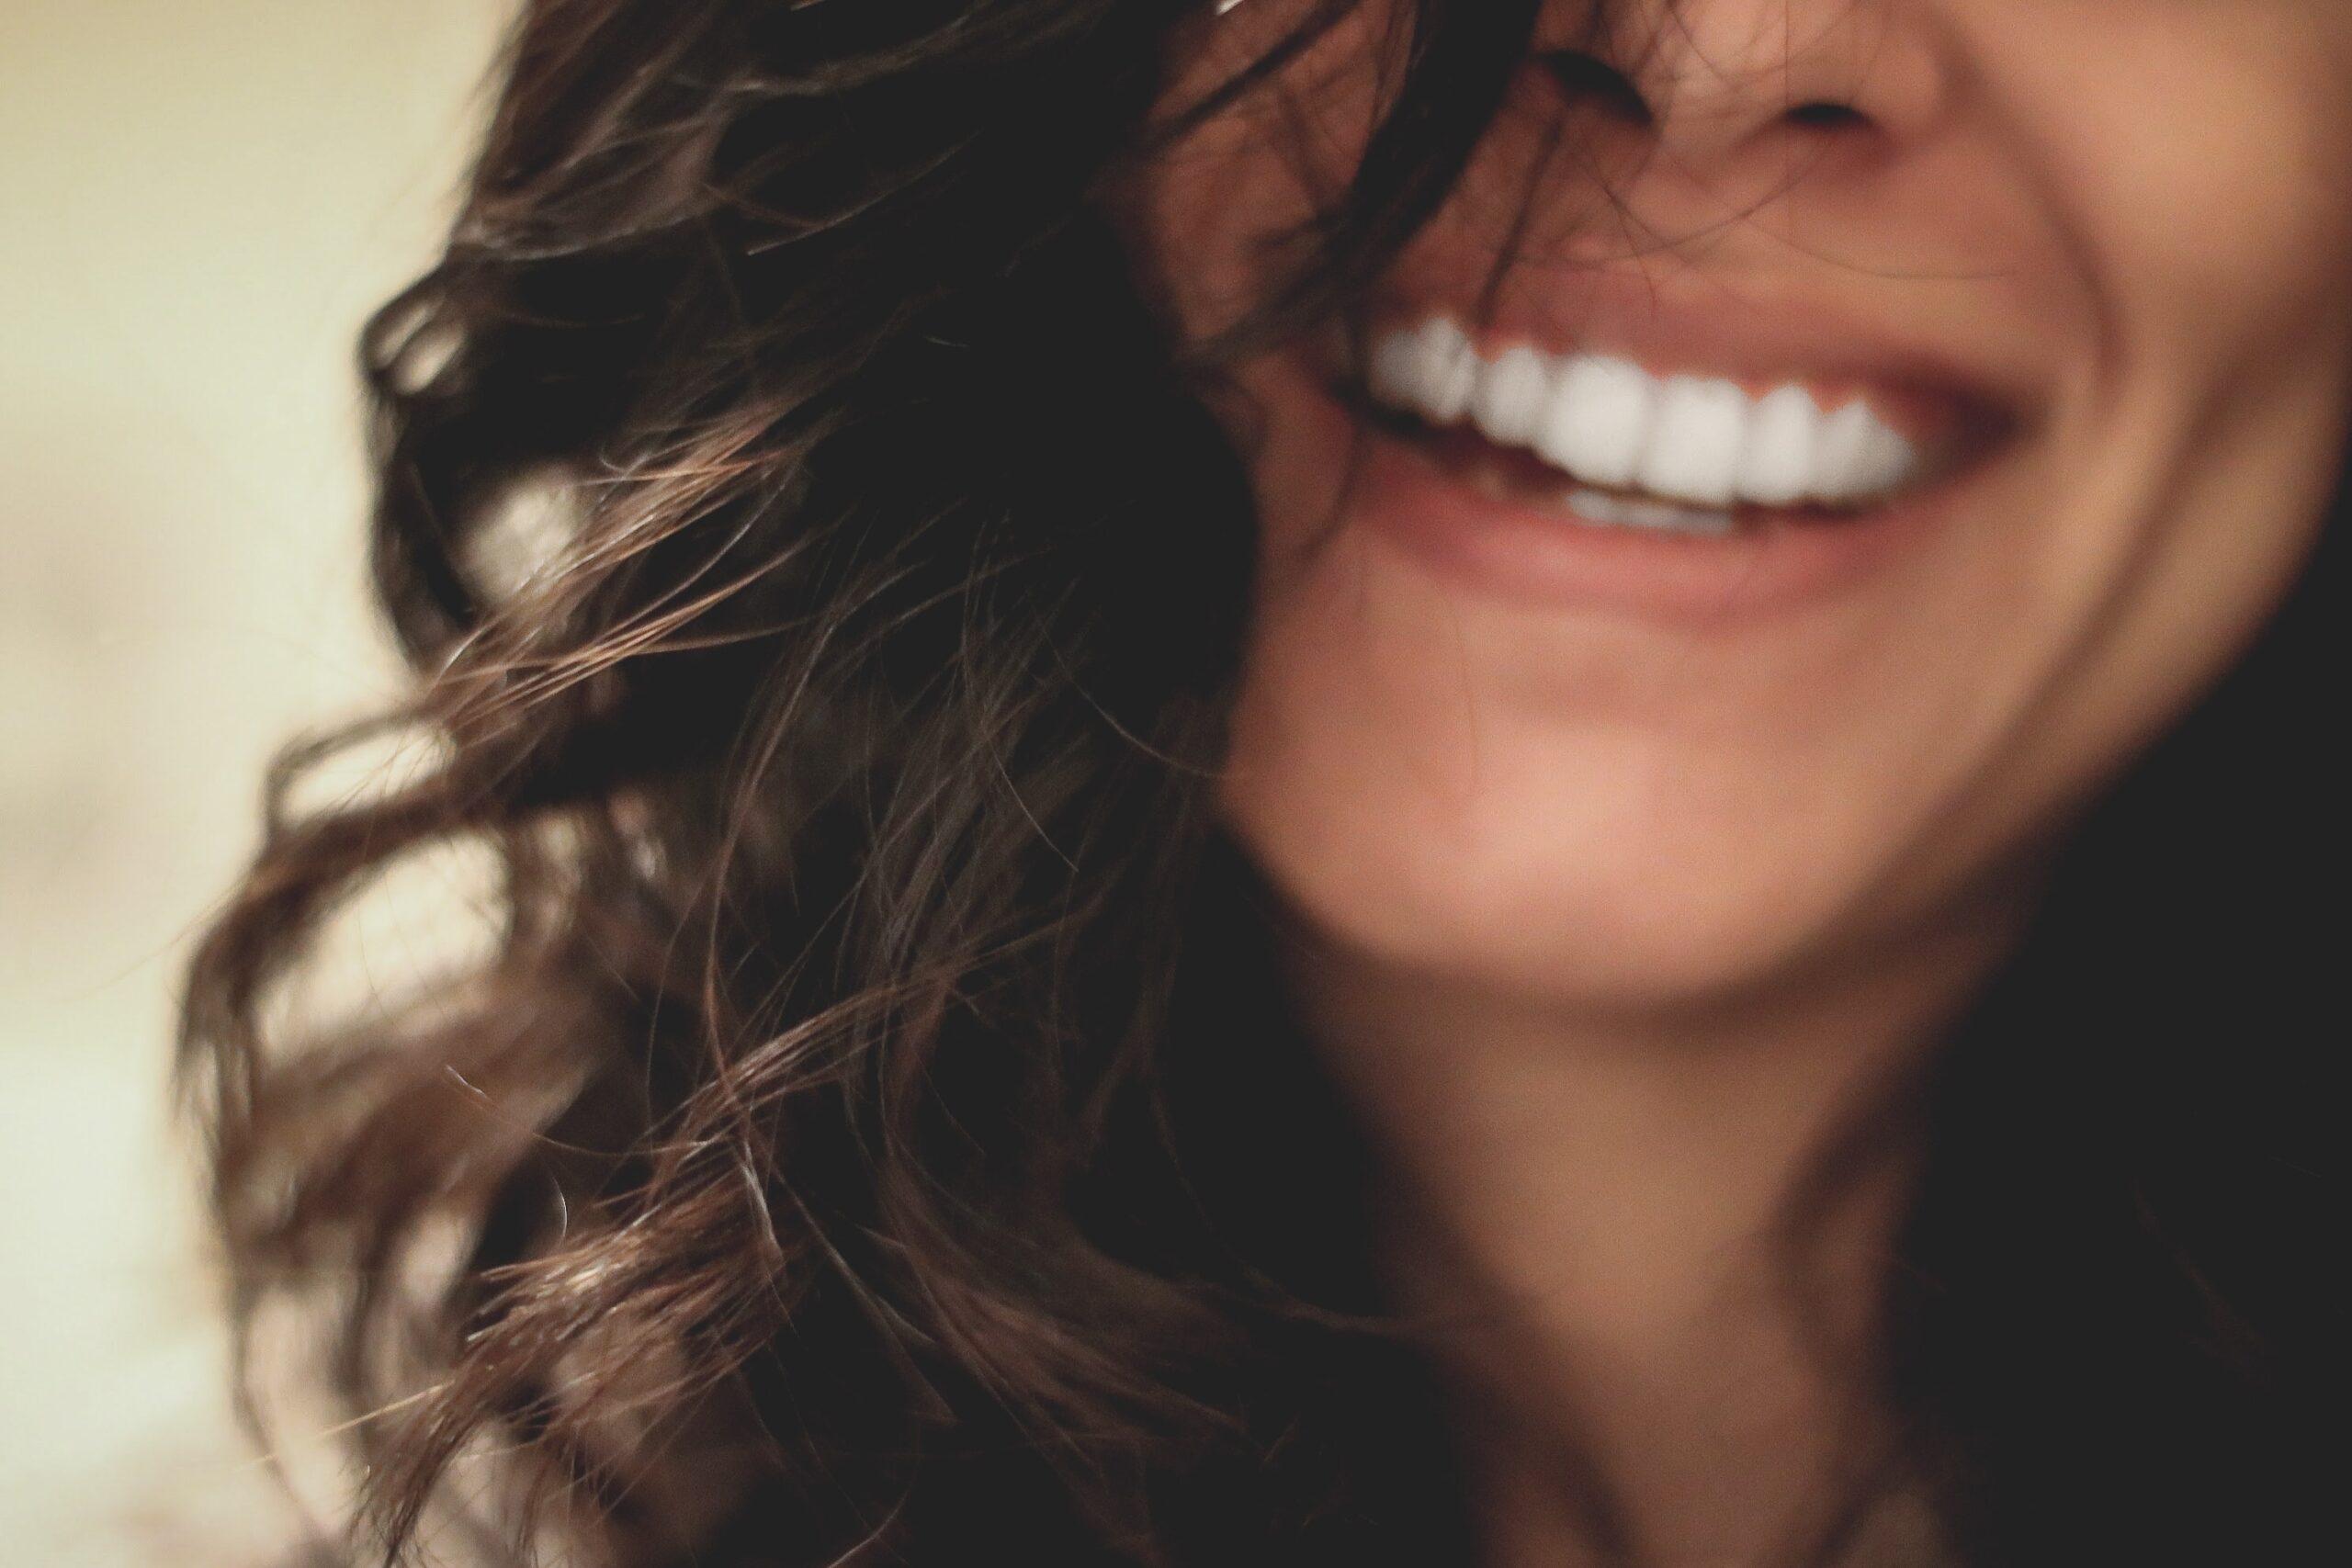 a mosolygas hatalma